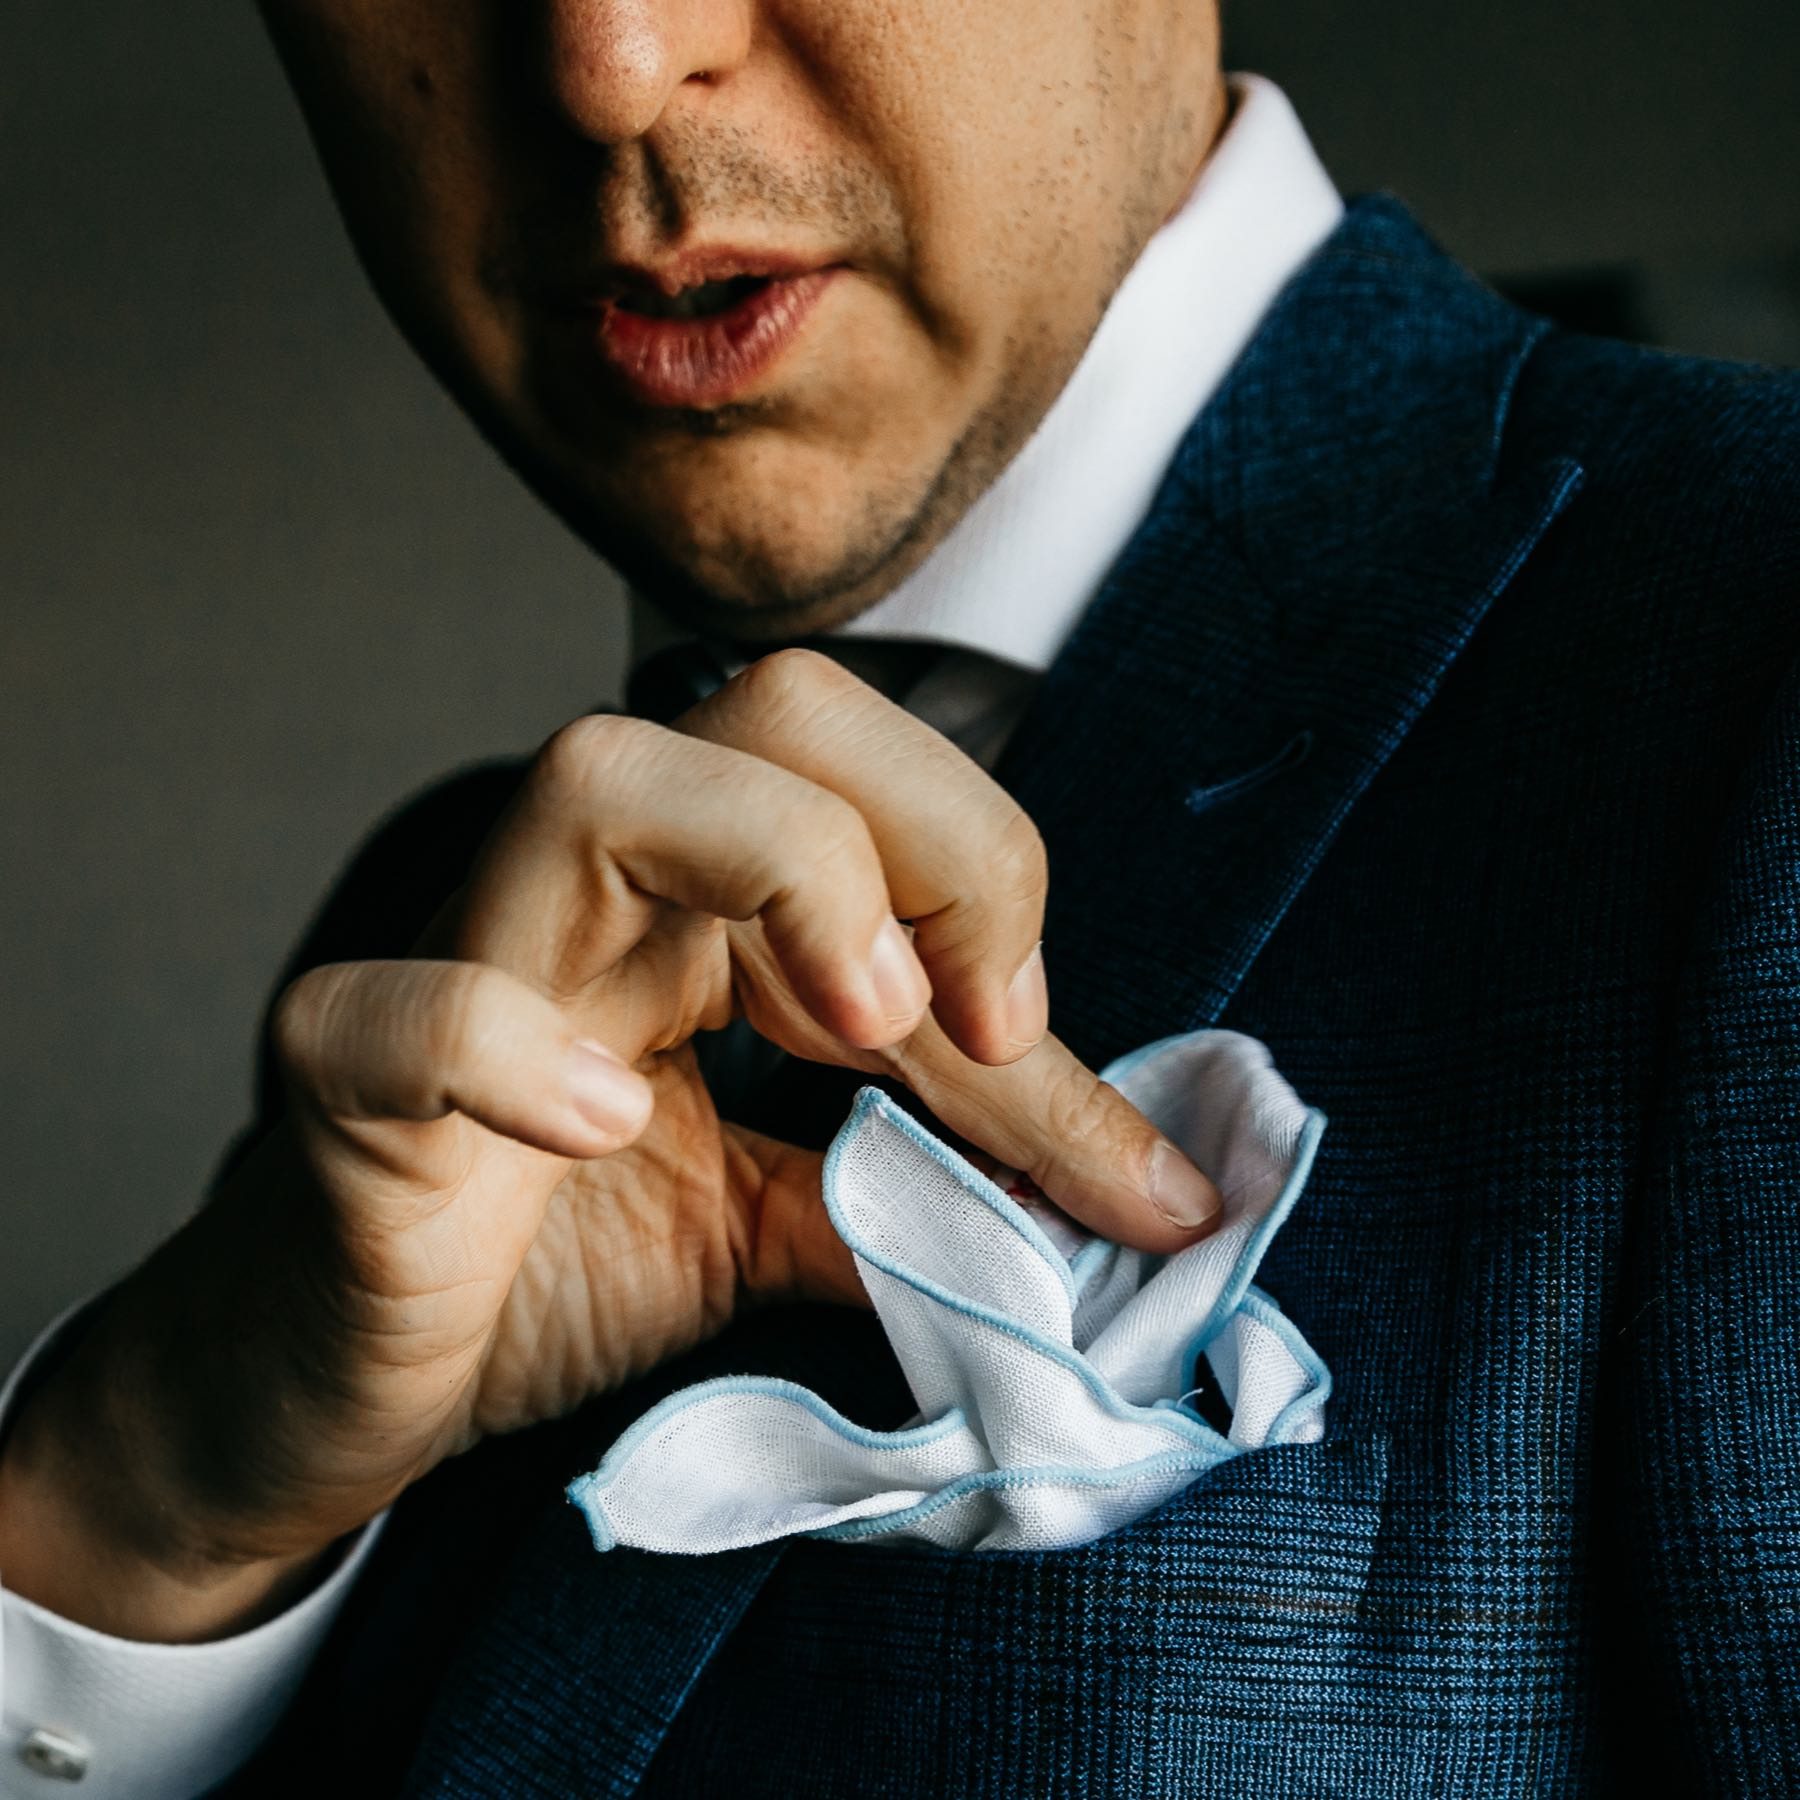 footer-wedding-image-7